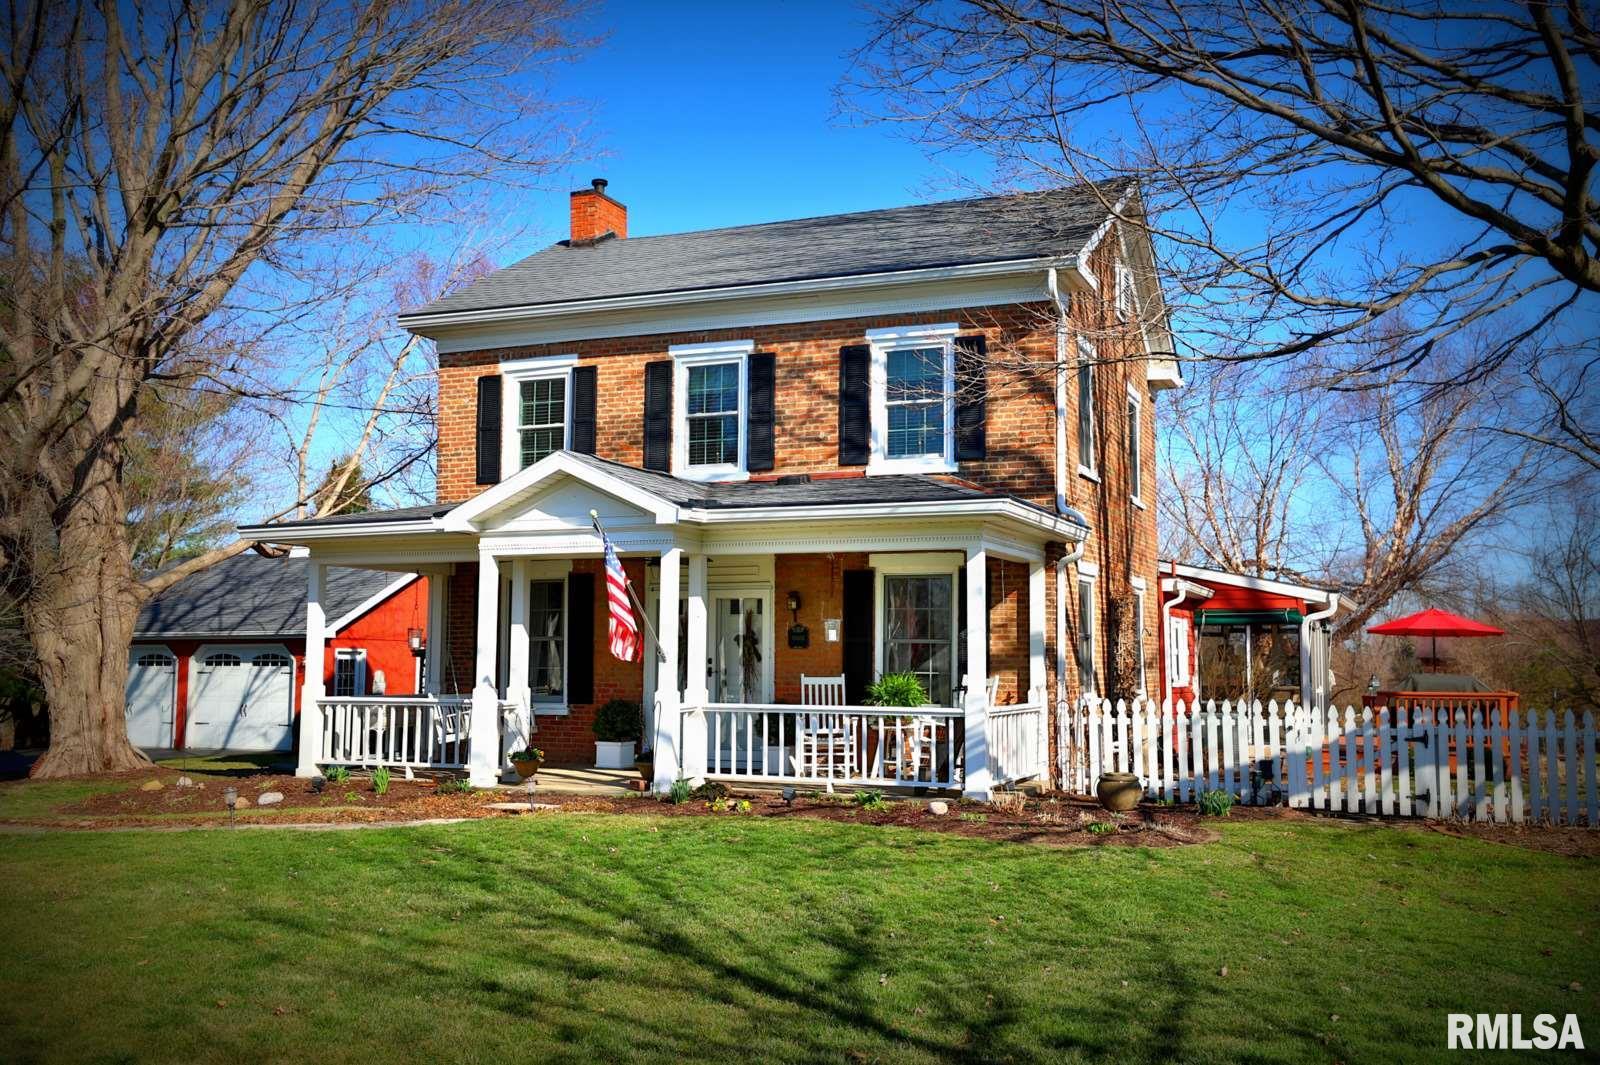 10013 LEGION HALL Property Photo - Princeville, IL real estate listing